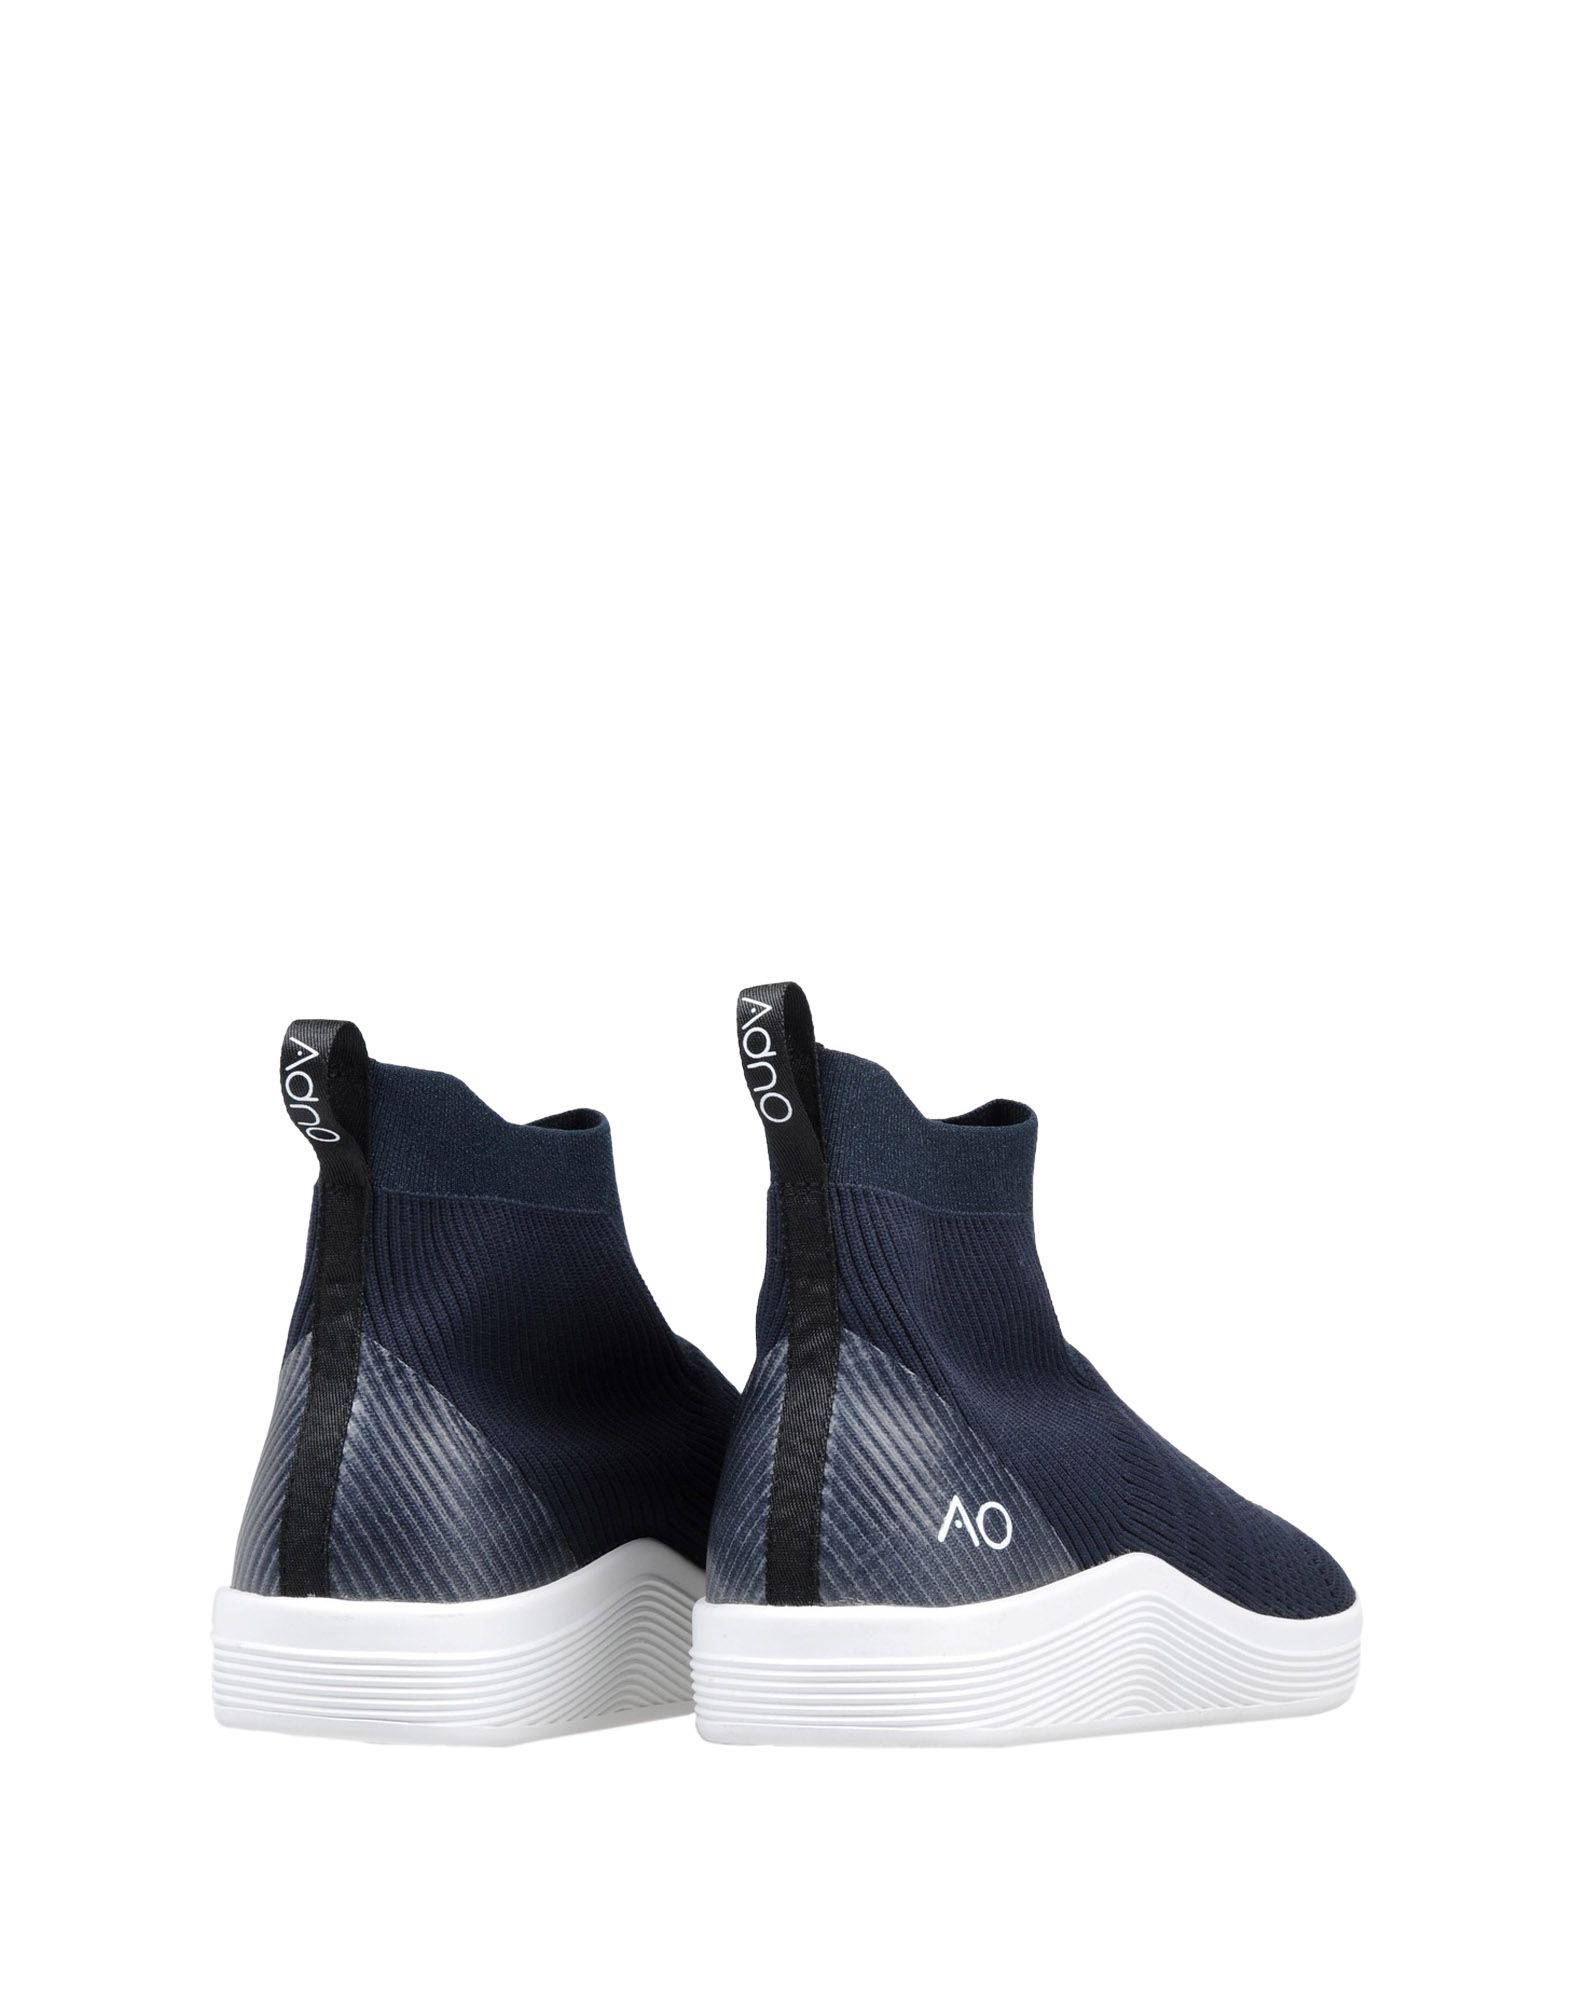 Adno® Relief 5.10  11237981EW 11237981EW 11237981EW Gute Qualität beliebte Schuhe a1db63